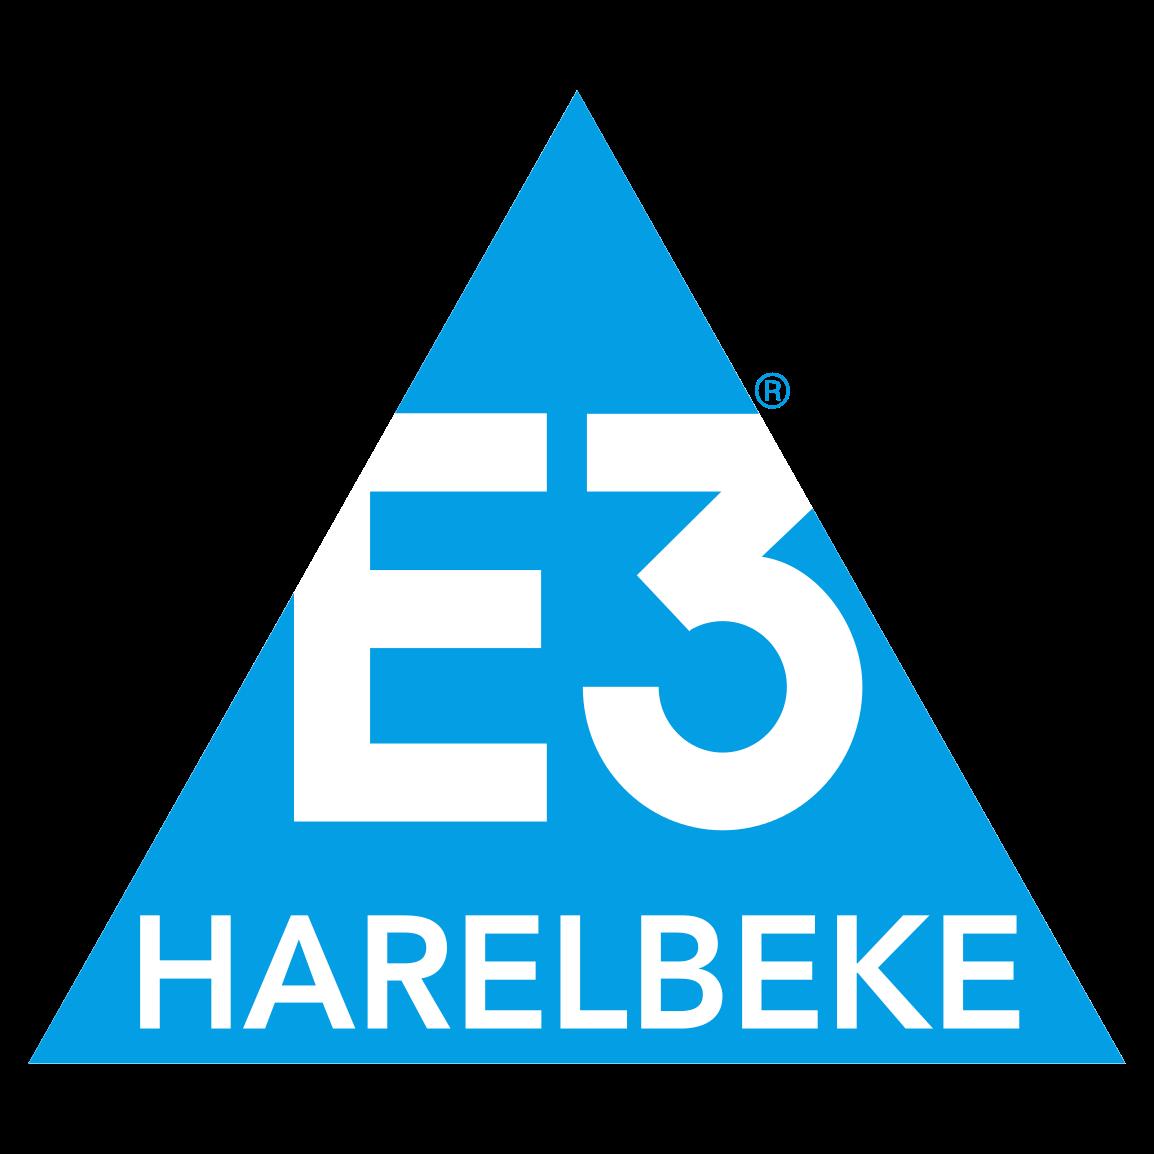 2018 UCI Cycling World Tour - E3 Harelbeke